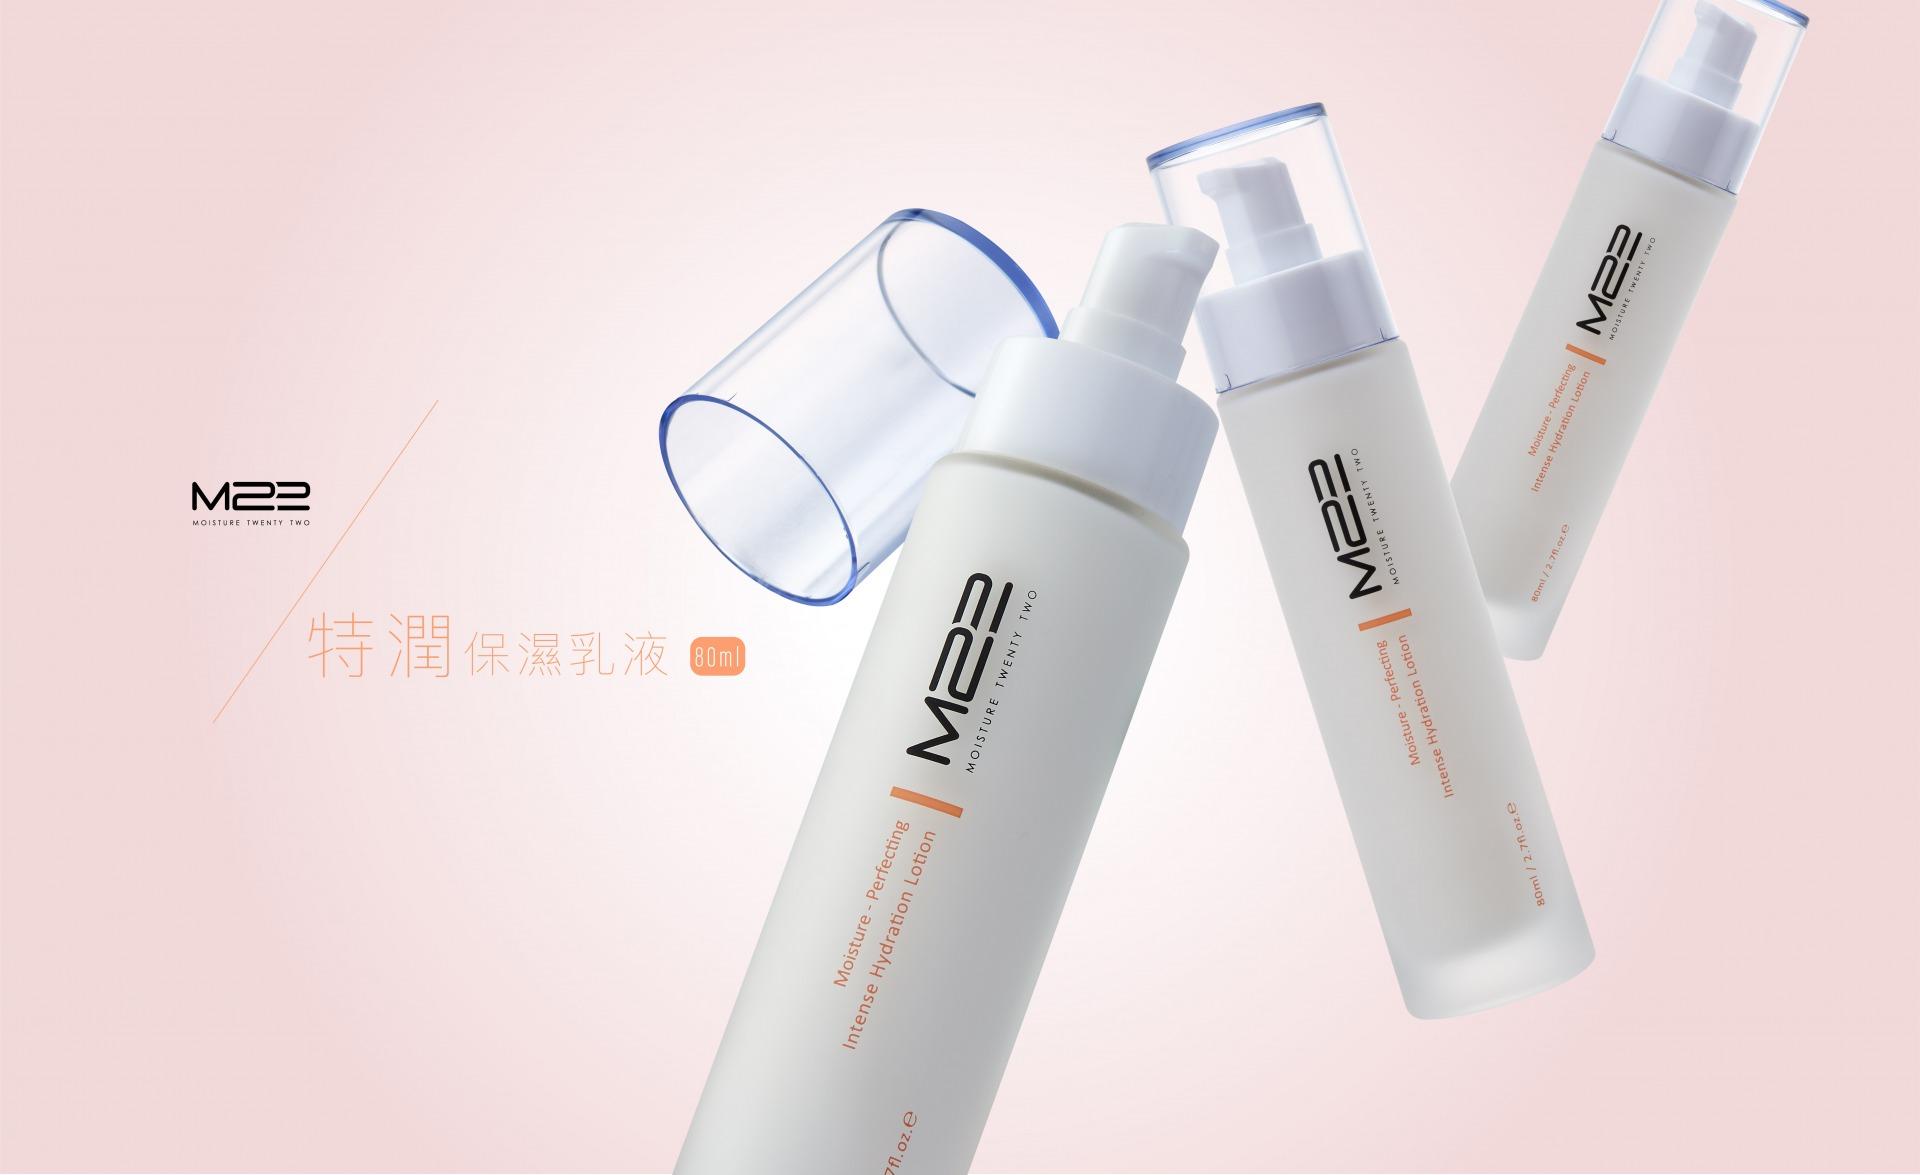 M22_v2_Products特潤保濕_特潤保濕乳液V2_index